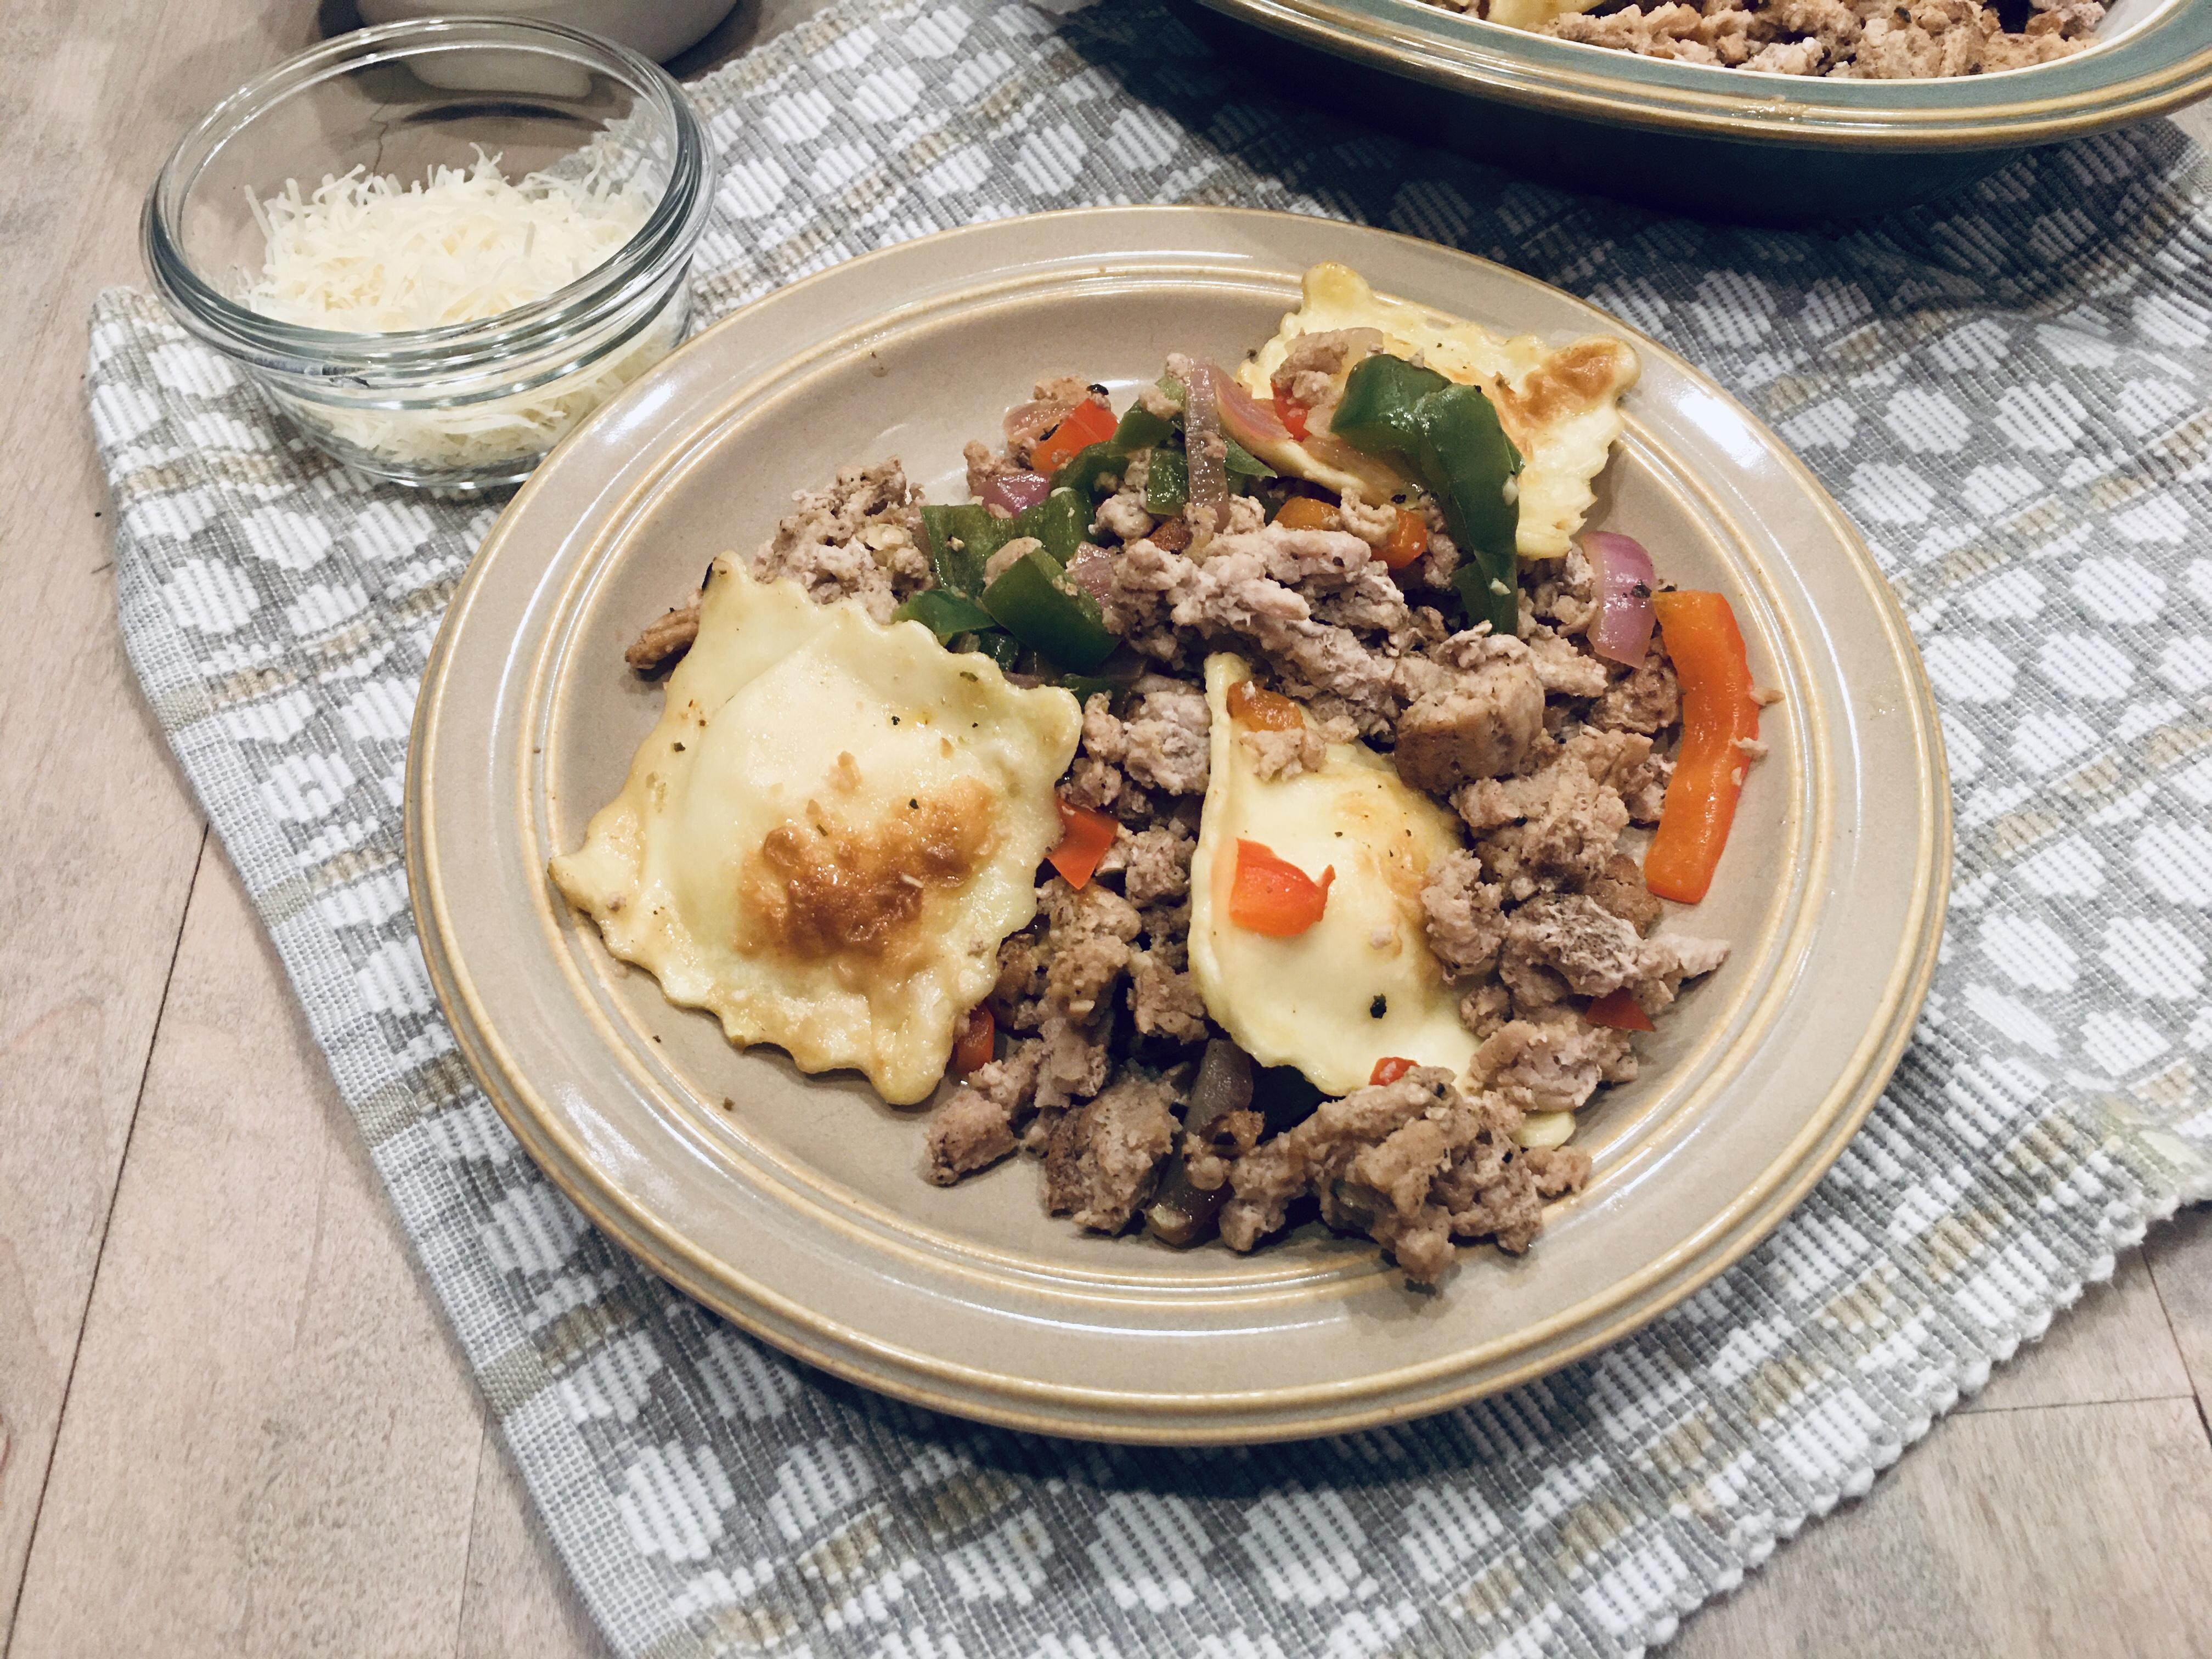 Ground Turkey & Cheese Ravioli Stir-fry